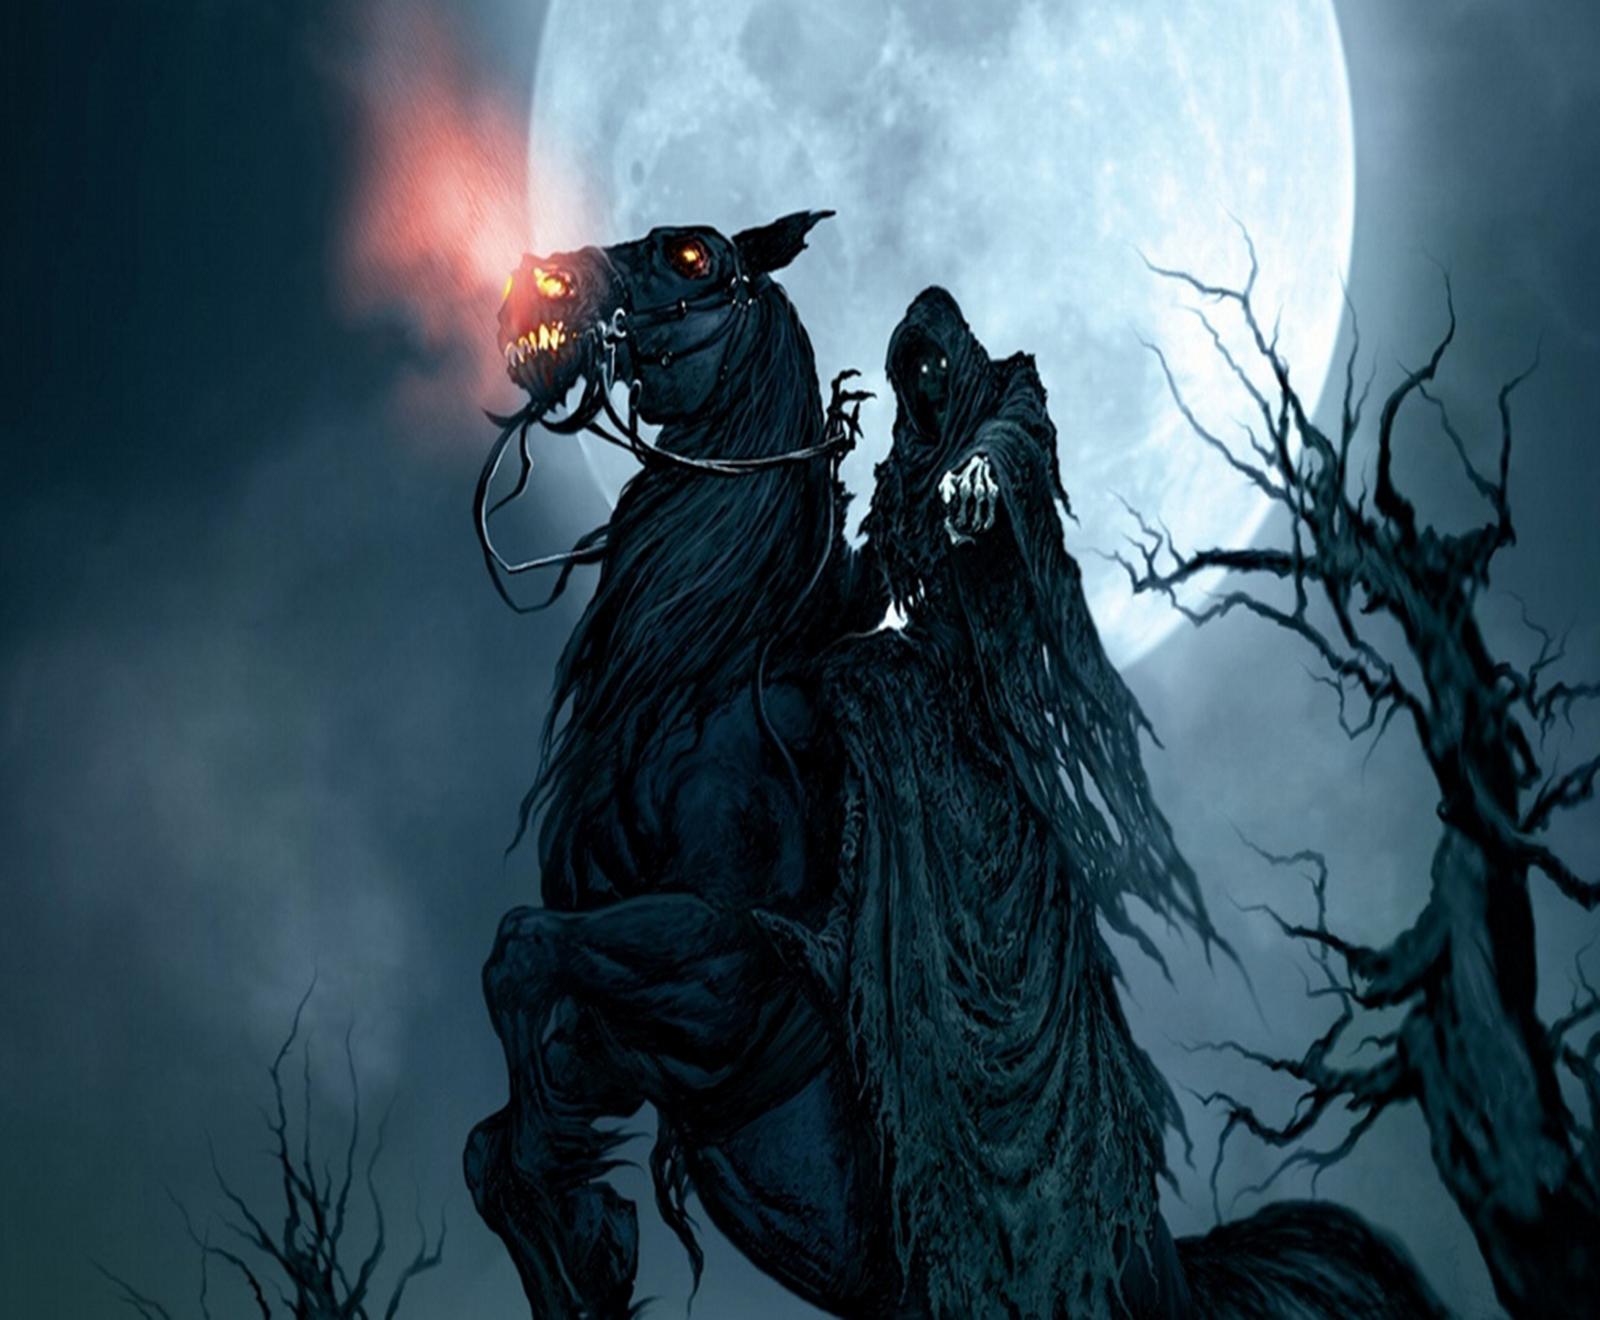 http://fc08.deviantart.net/fs71/i/2013/293/3/6/grim_reaper_full_moon_by_myjavier007-d6r7rxz.png